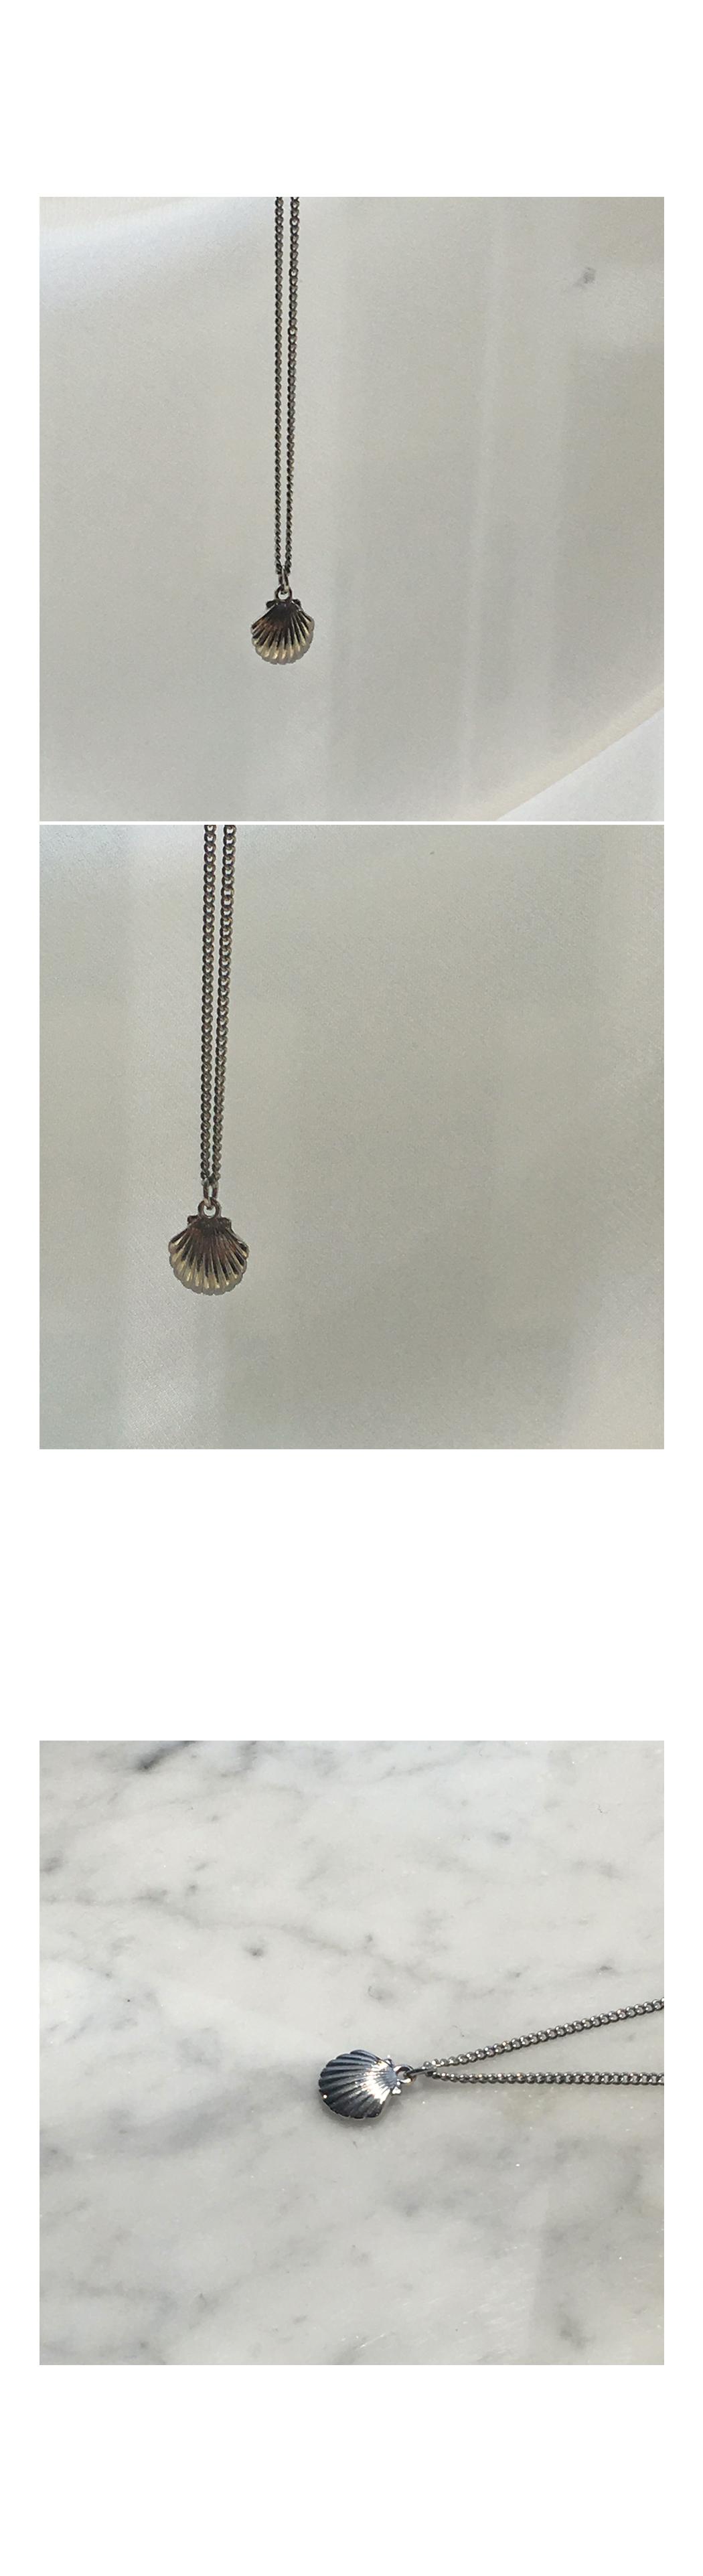 Zem No.272 (necklace)